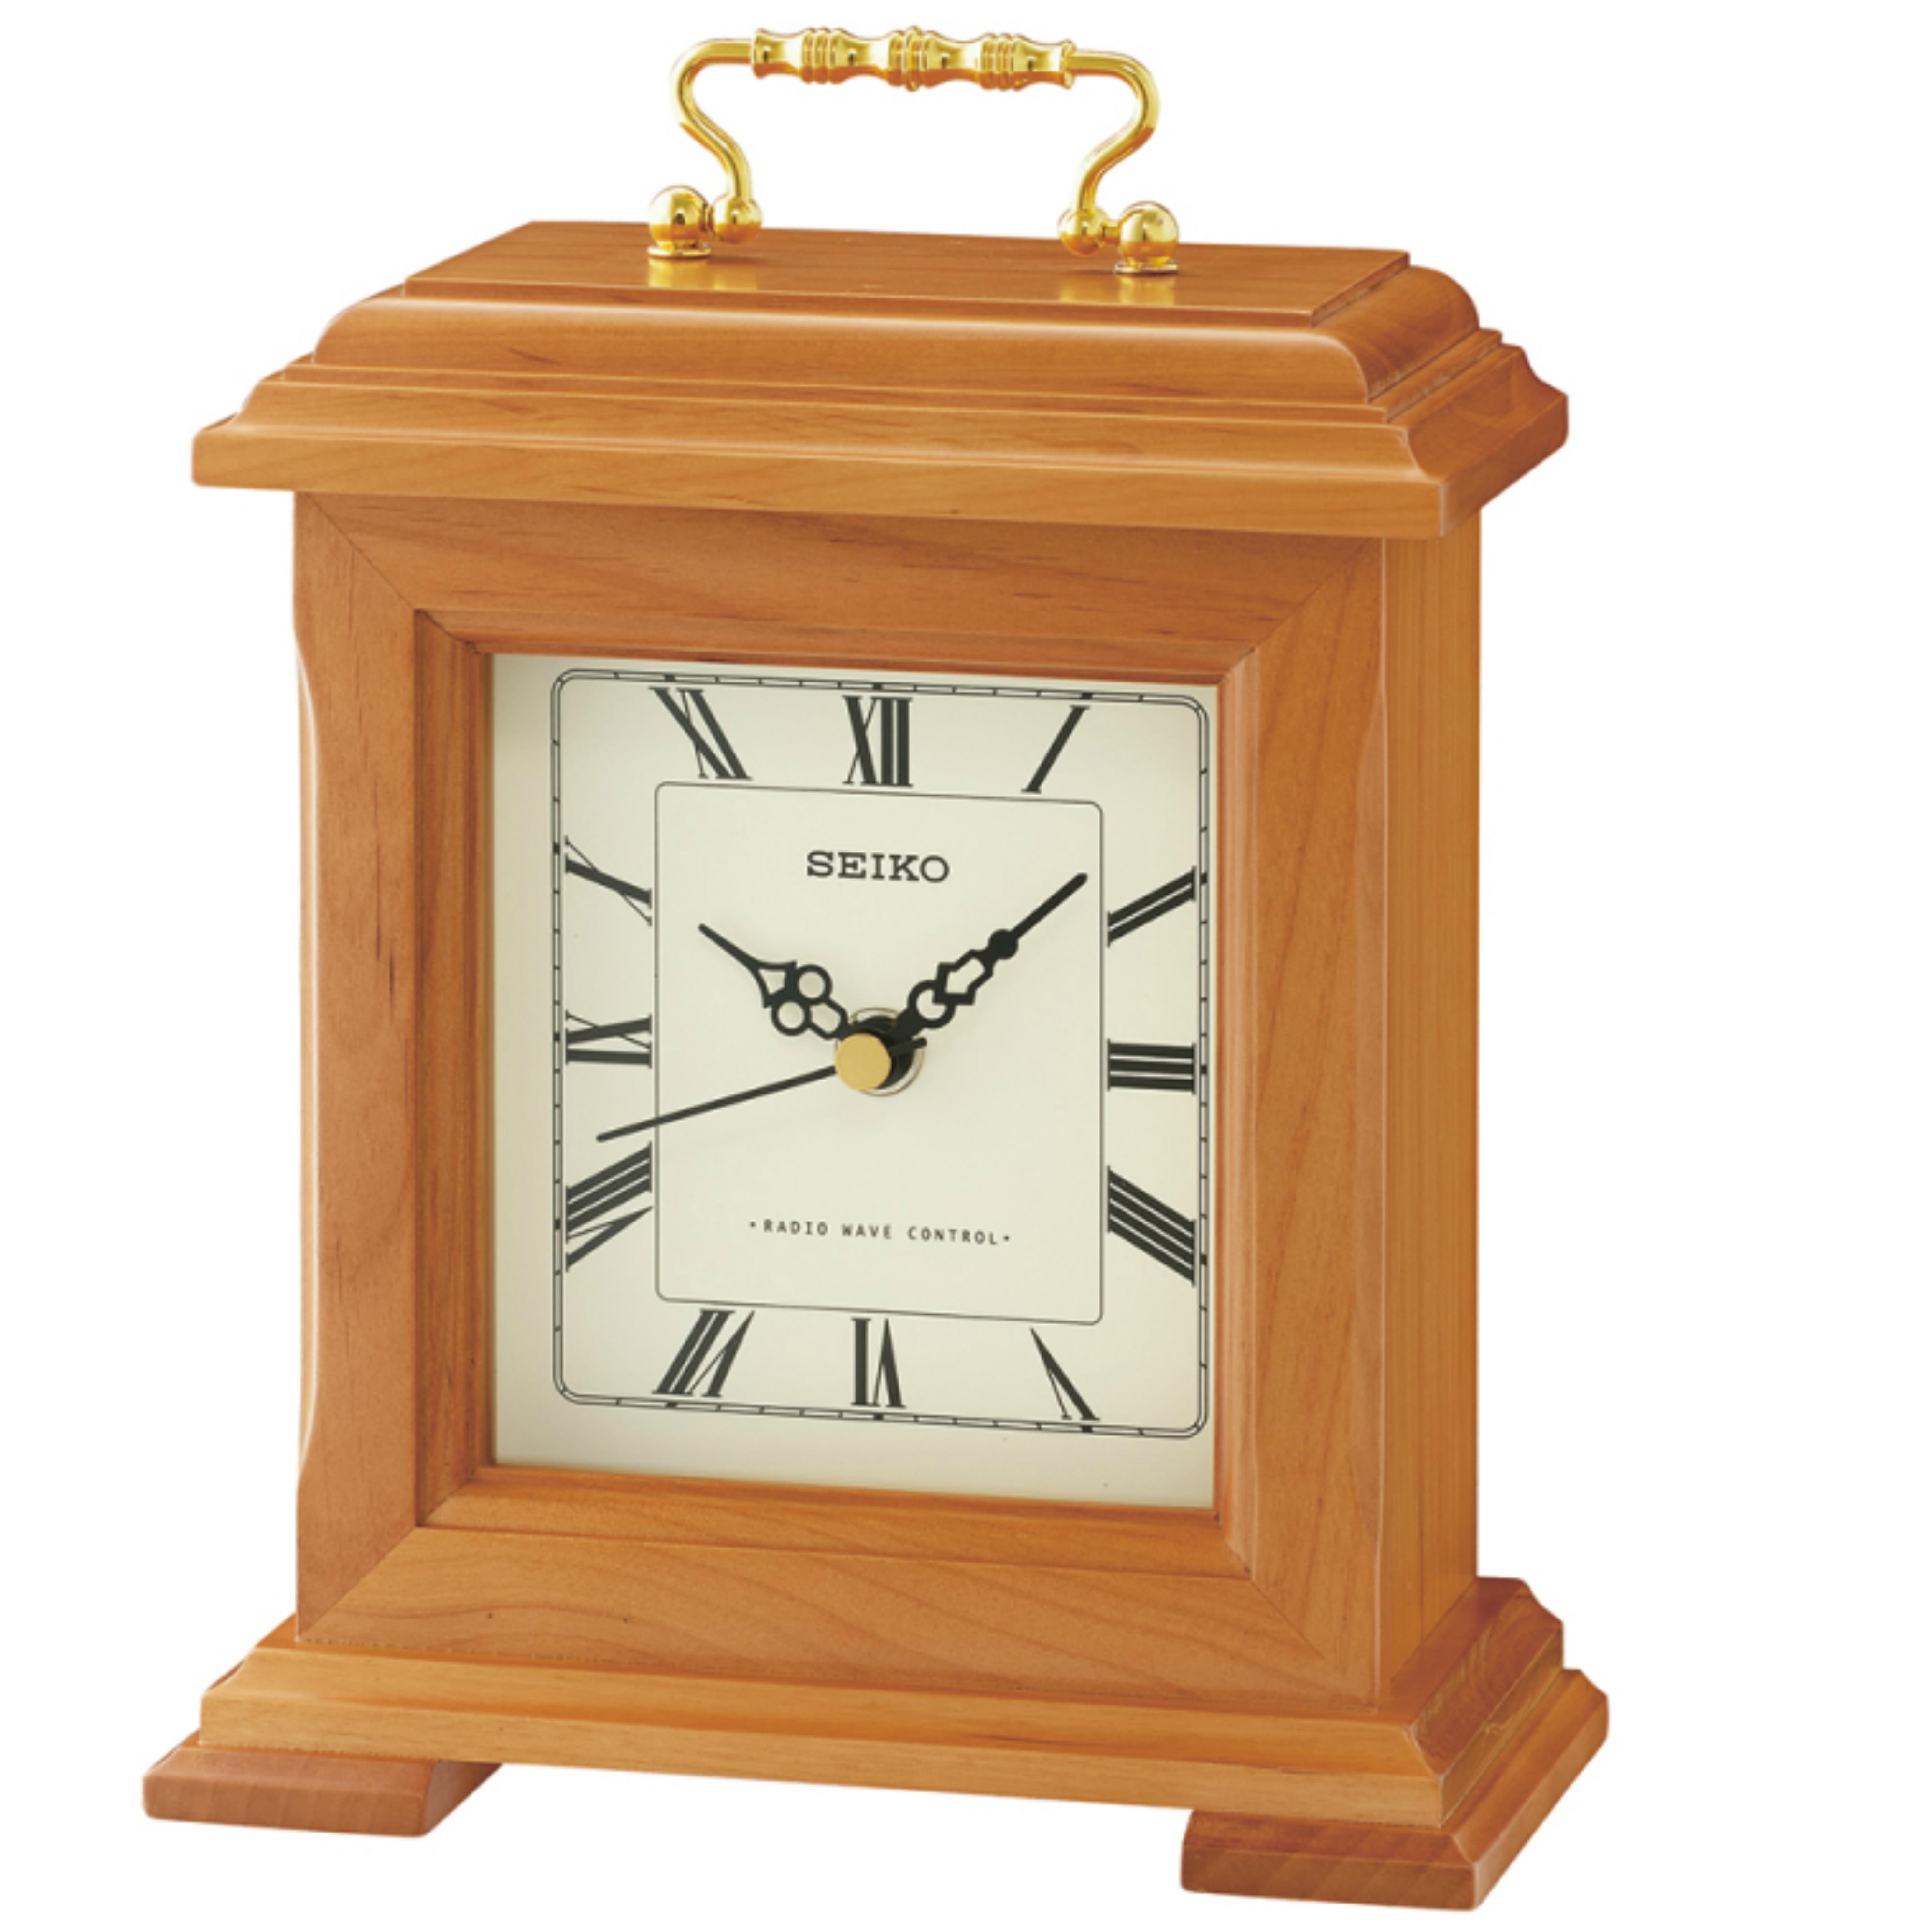 Seiko QXR304B Radio Controlled Wooden Mantel Clock|Roman Numerals|Light Brown|